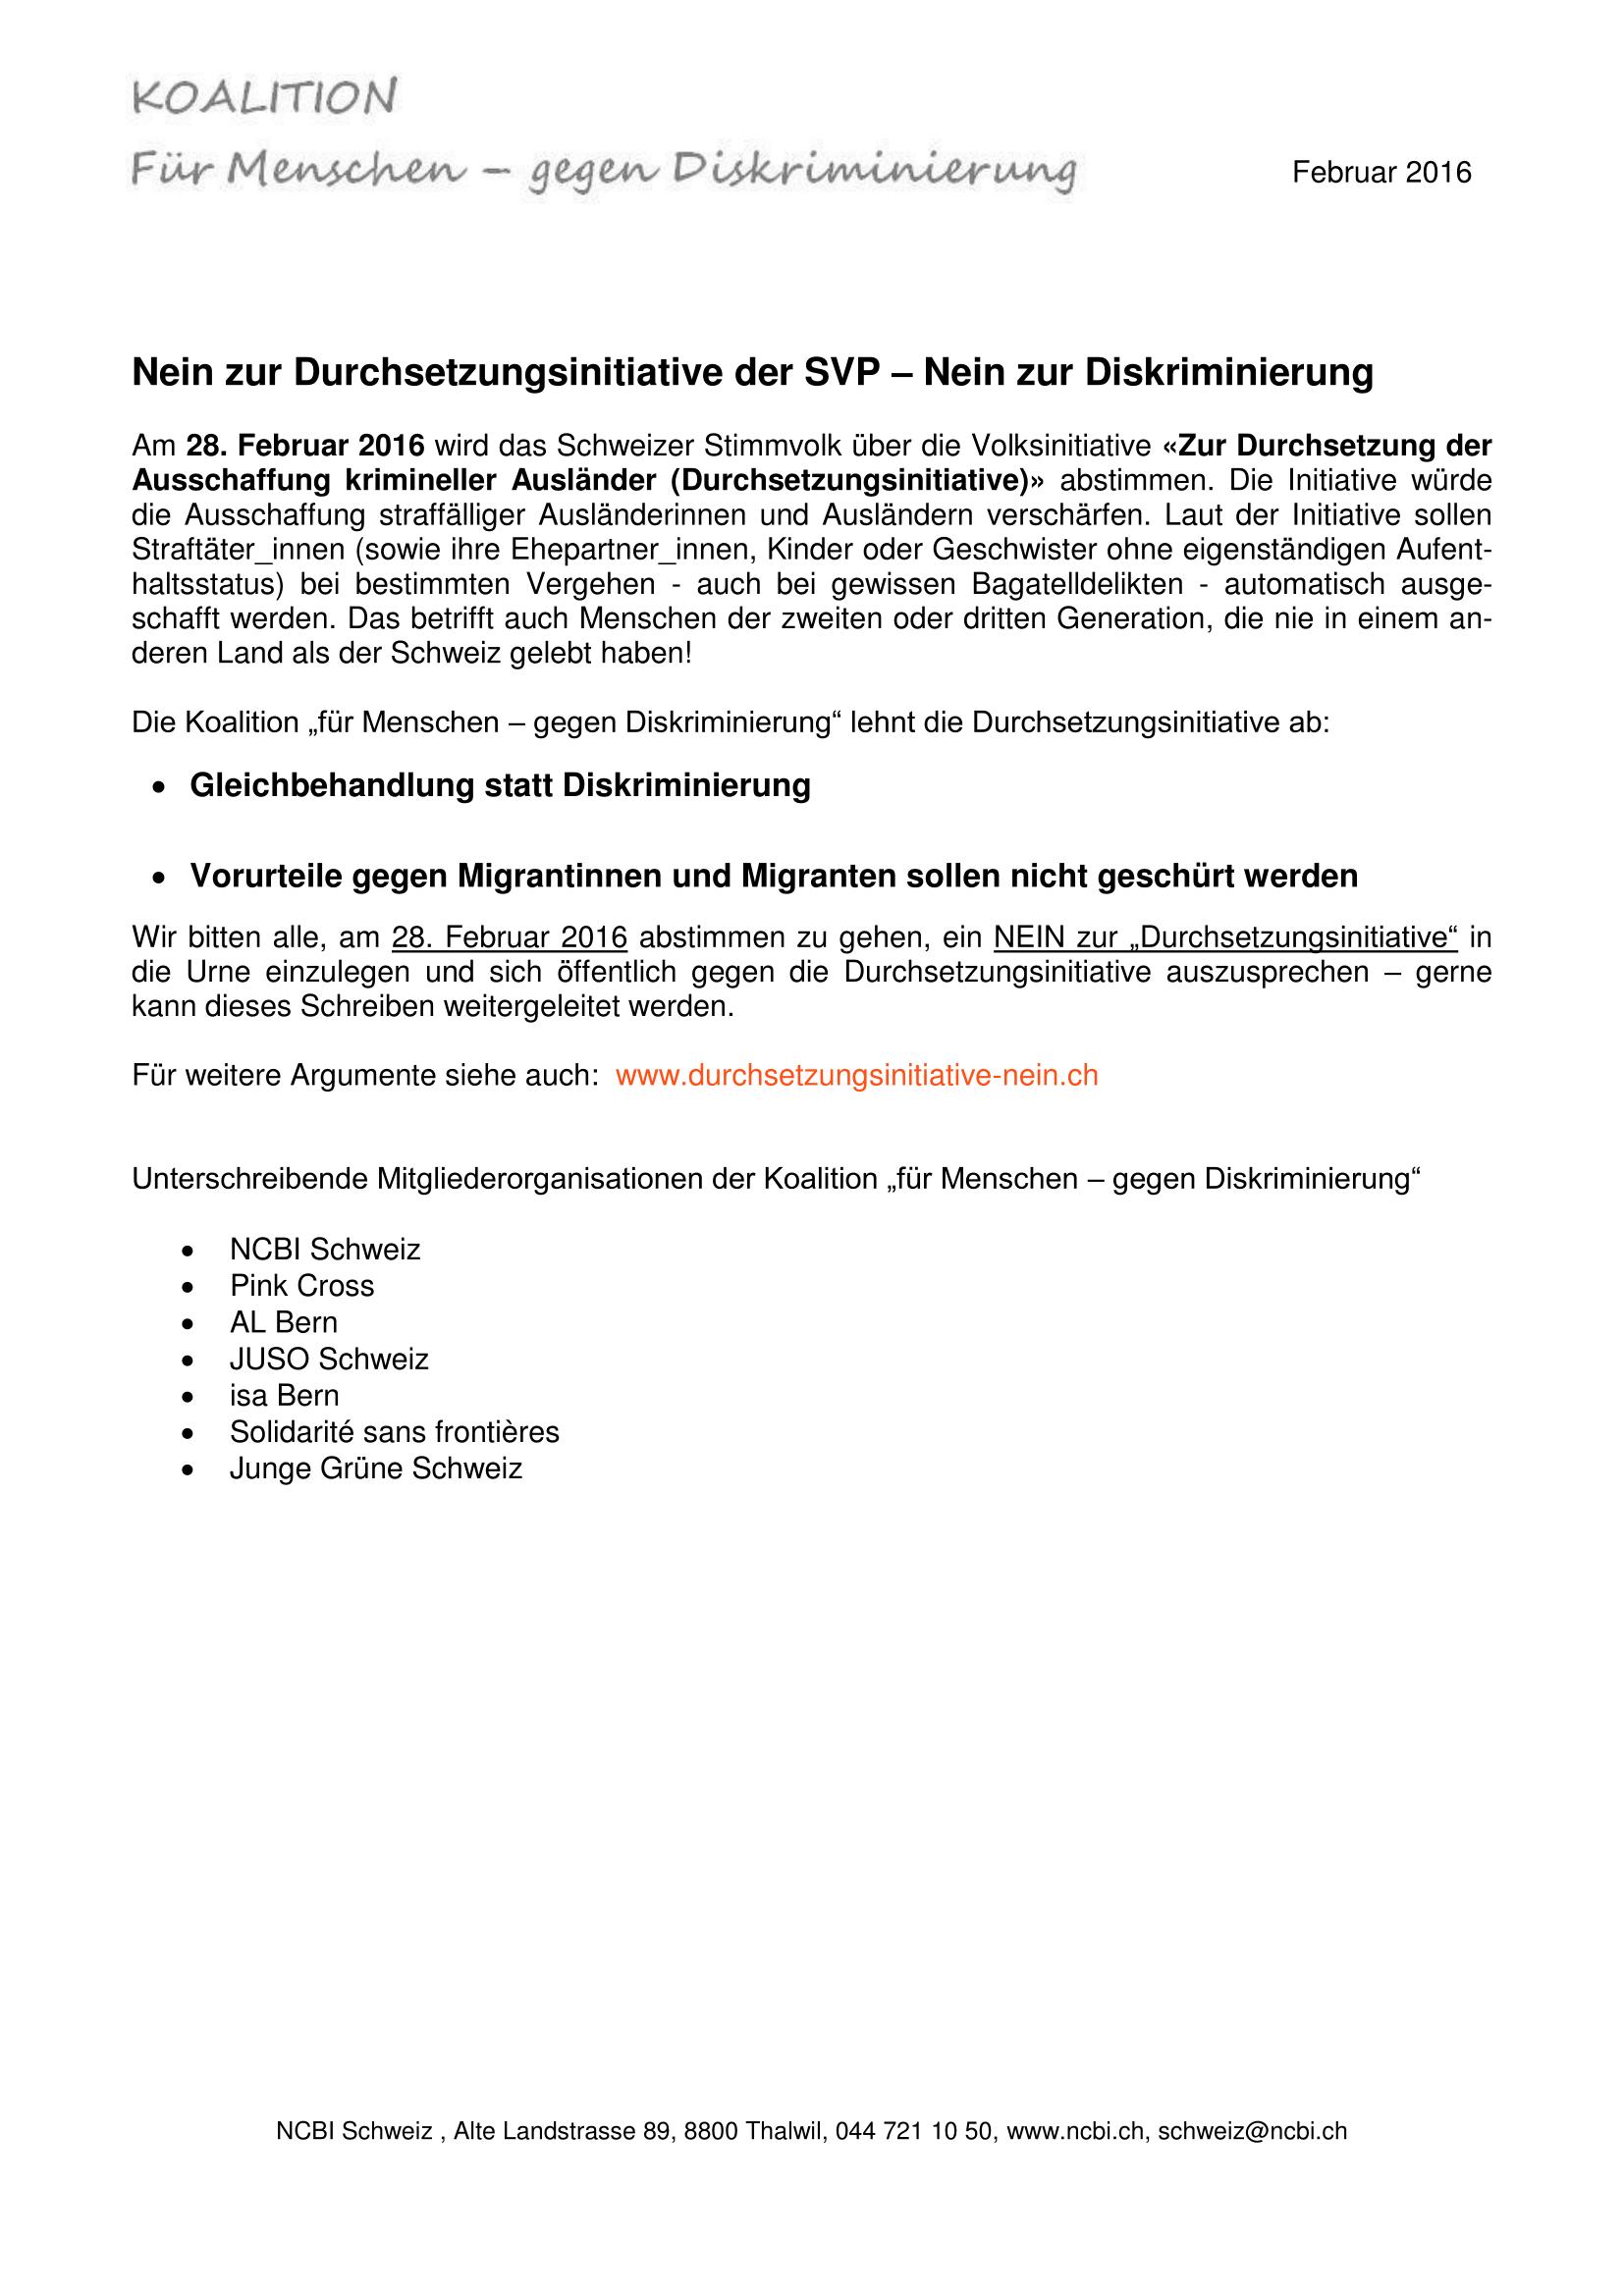 Stellungsnahme zur Durchsetzungsinitiative Koalition fMgD-1